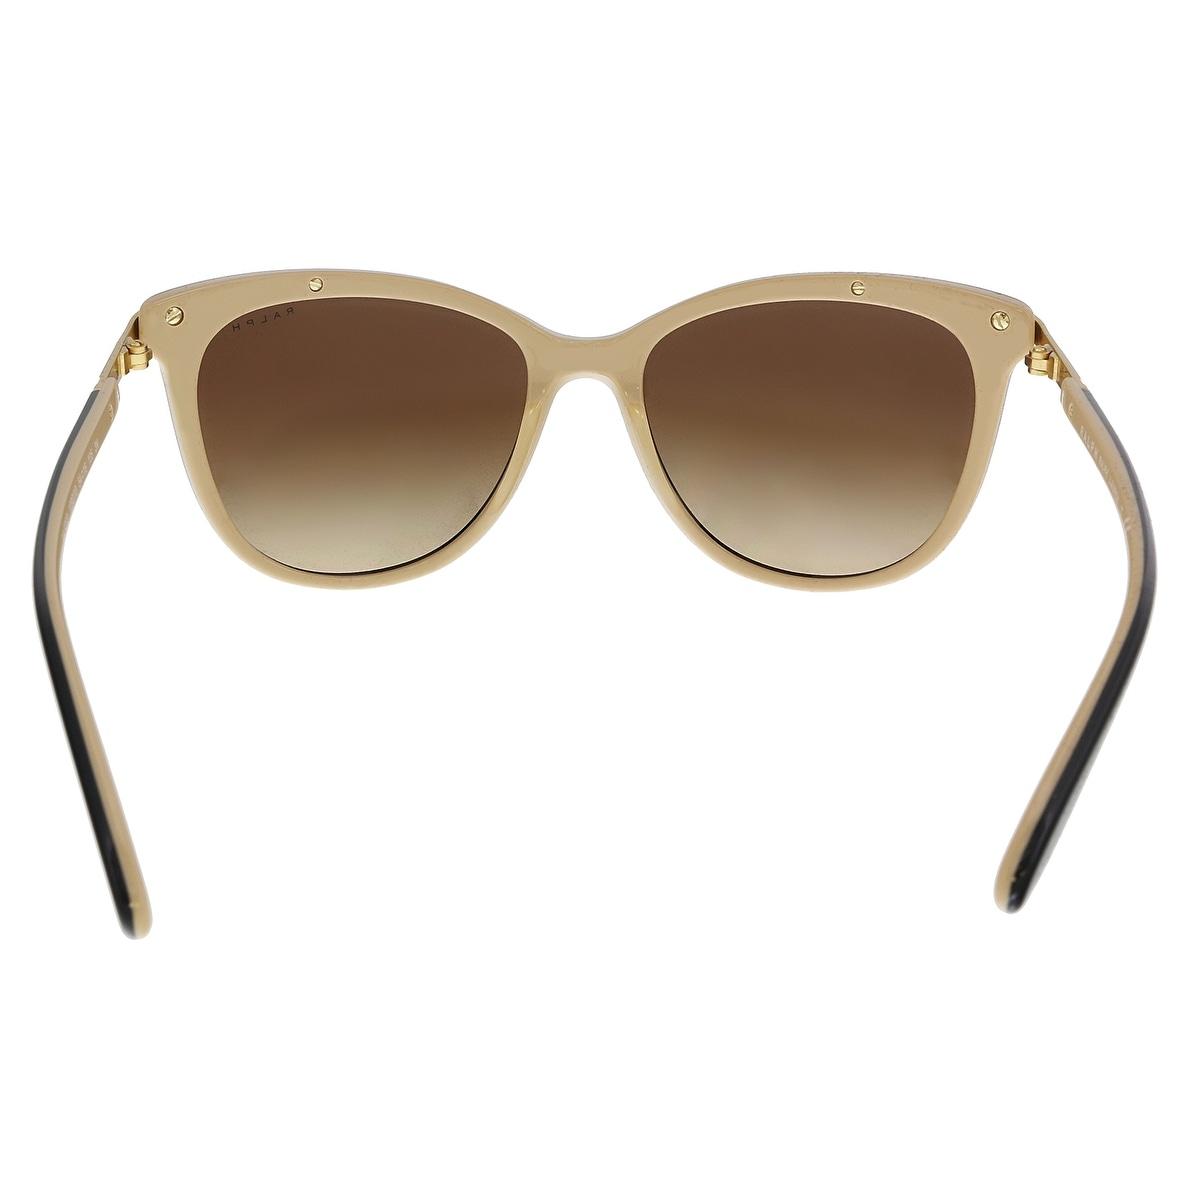 7ca651a93024 Shop Ralph Lauren RA5203 109013 Black Nude Cat eye Sunglasses - 54-16-135 - Free  Shipping Today - Overstock - 22087945